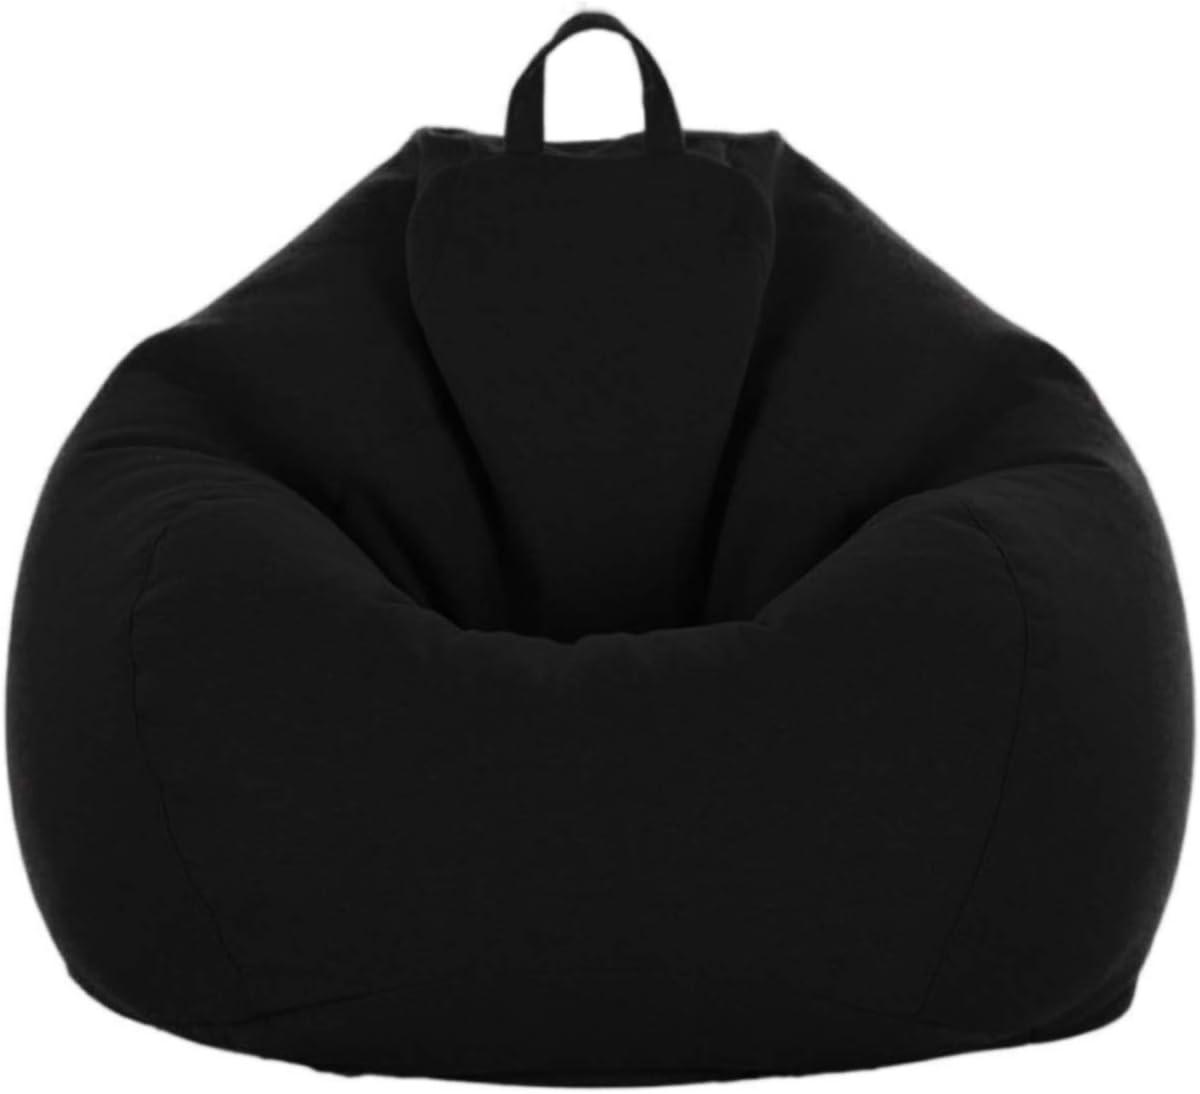 "iBccly [No Filler] Bean Bag Chair Cover, Soft Bean Bags Chairs for Kids Teens | Stuffable Zipper Beanbag for Organizing Children Plush Toys for Garden Lounge Dorm Room (Black, L-35.4""x 43.3"")"